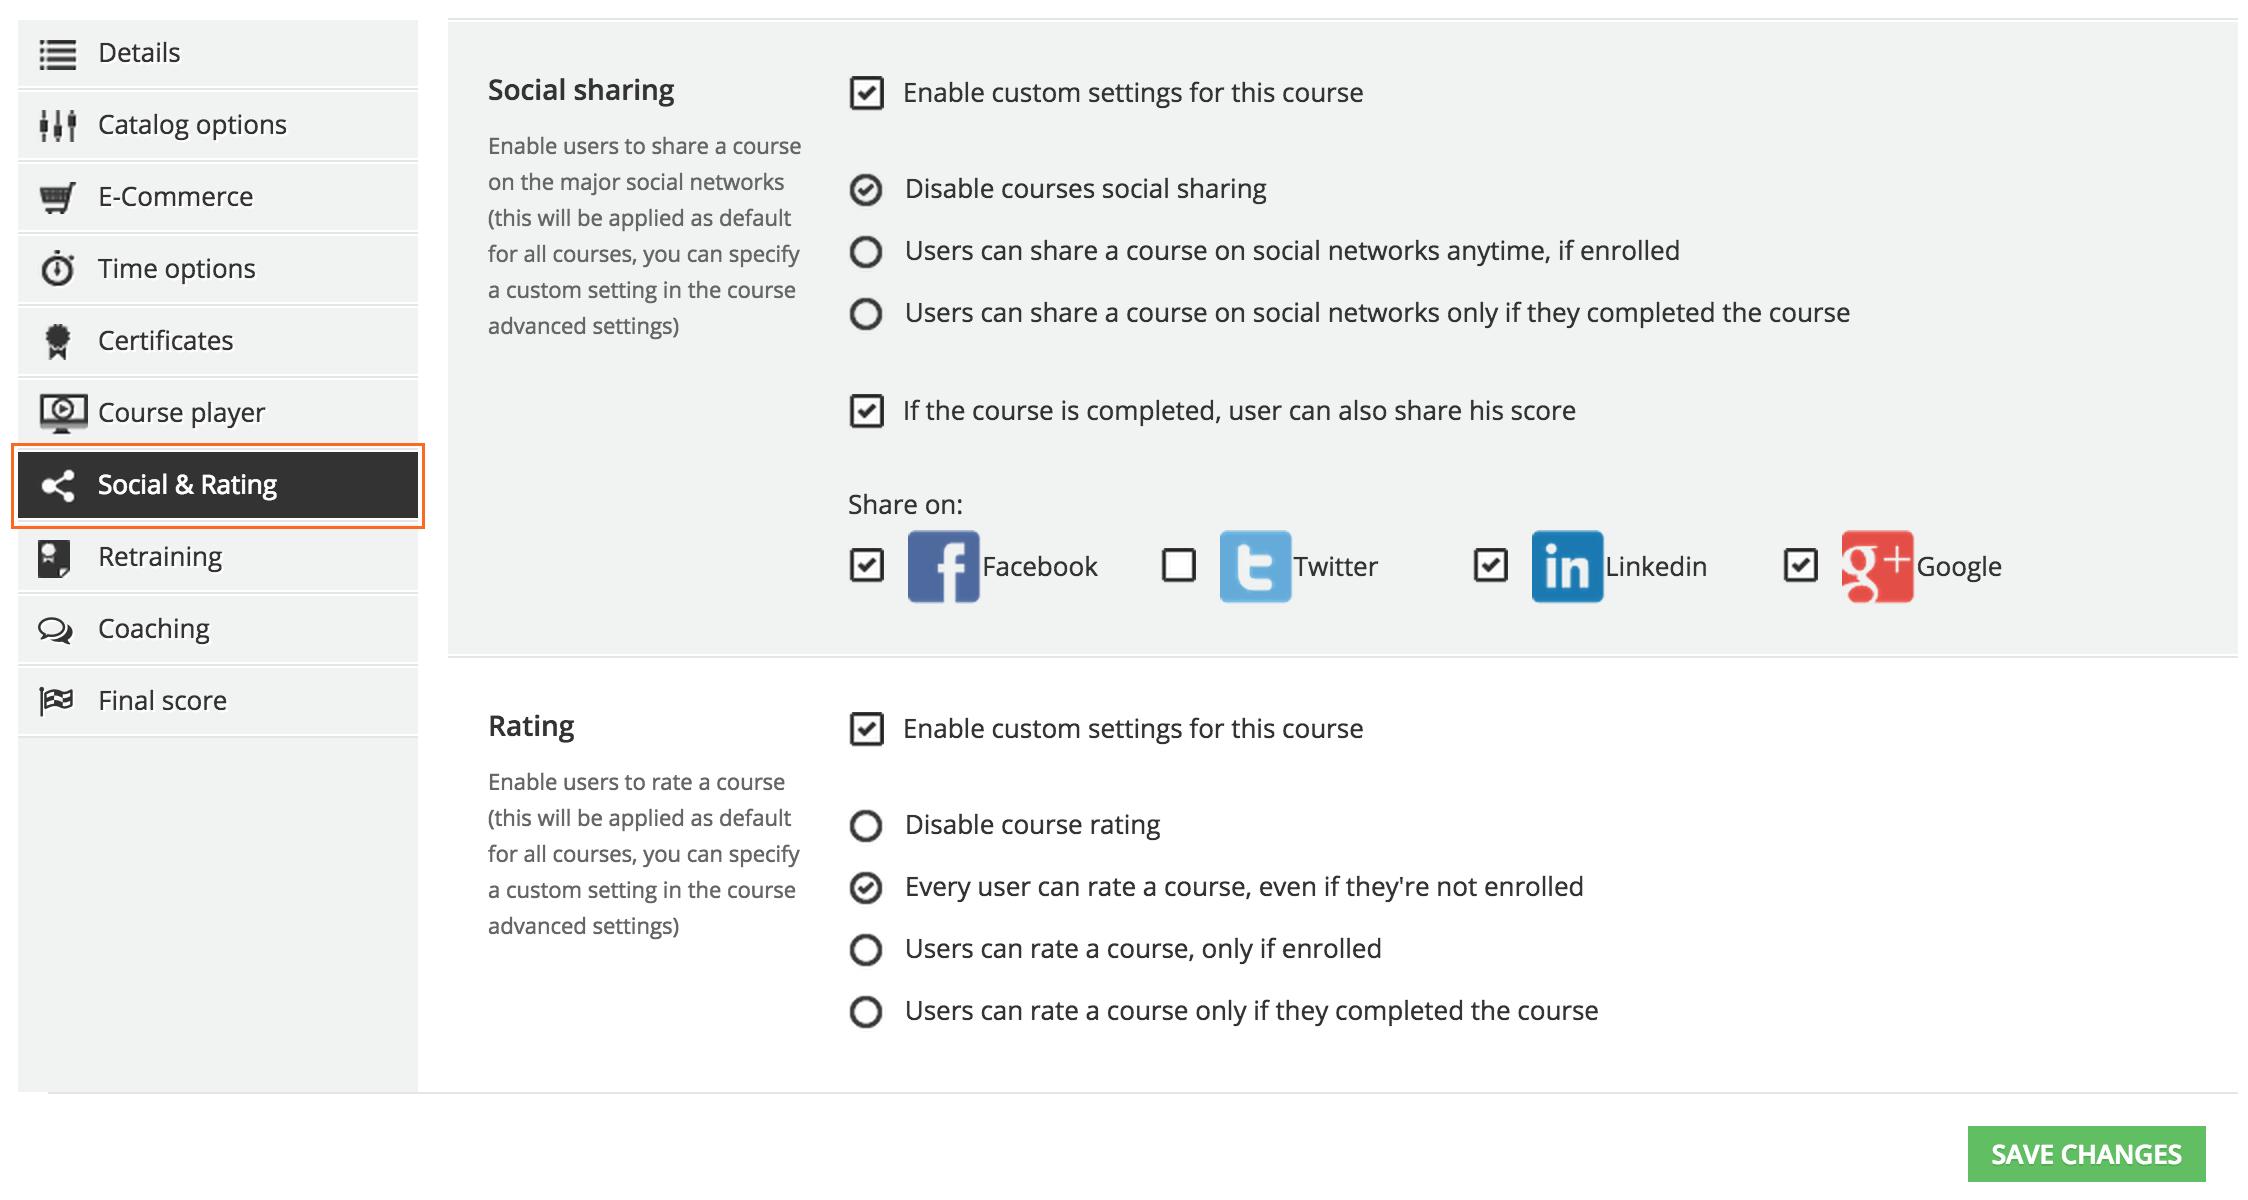 advanced settings Social&Rating